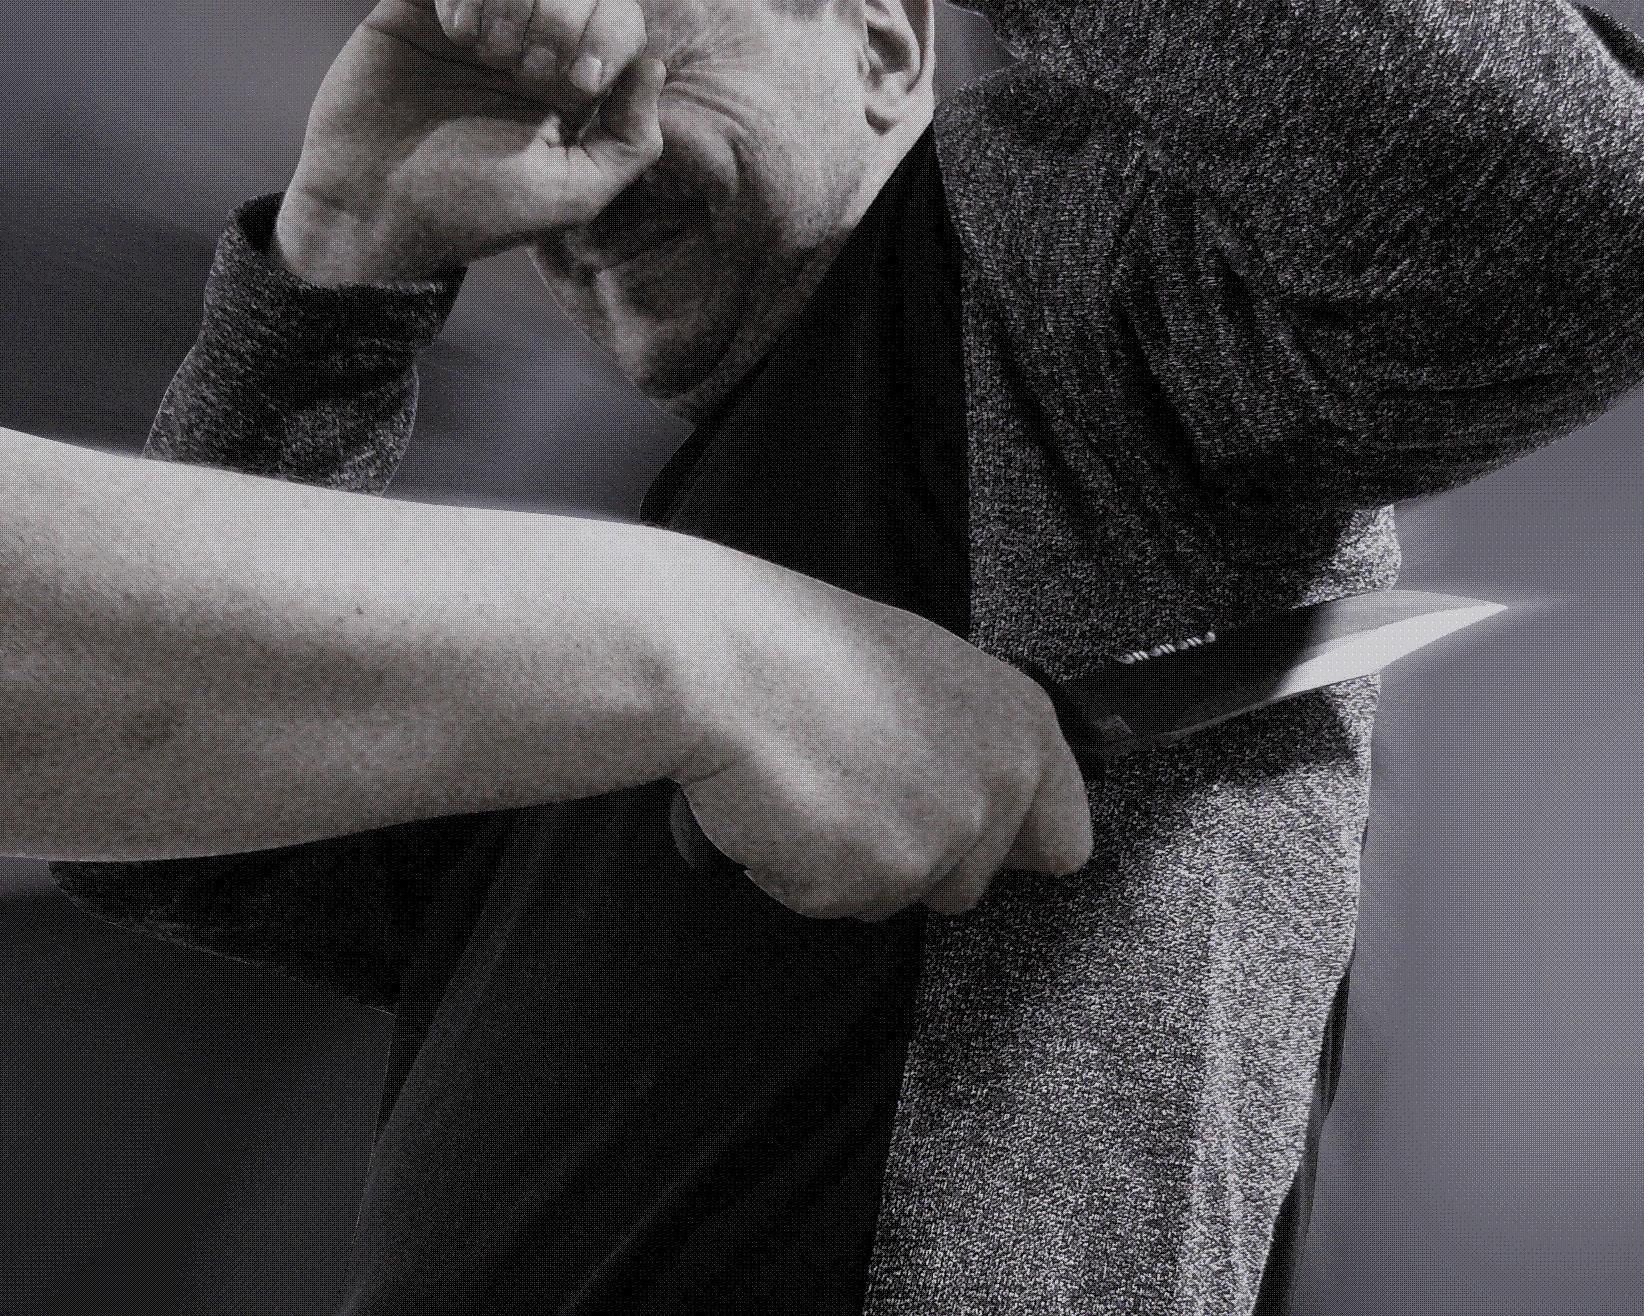 Performance Fabrics for Anti-Cut / Slash Protection